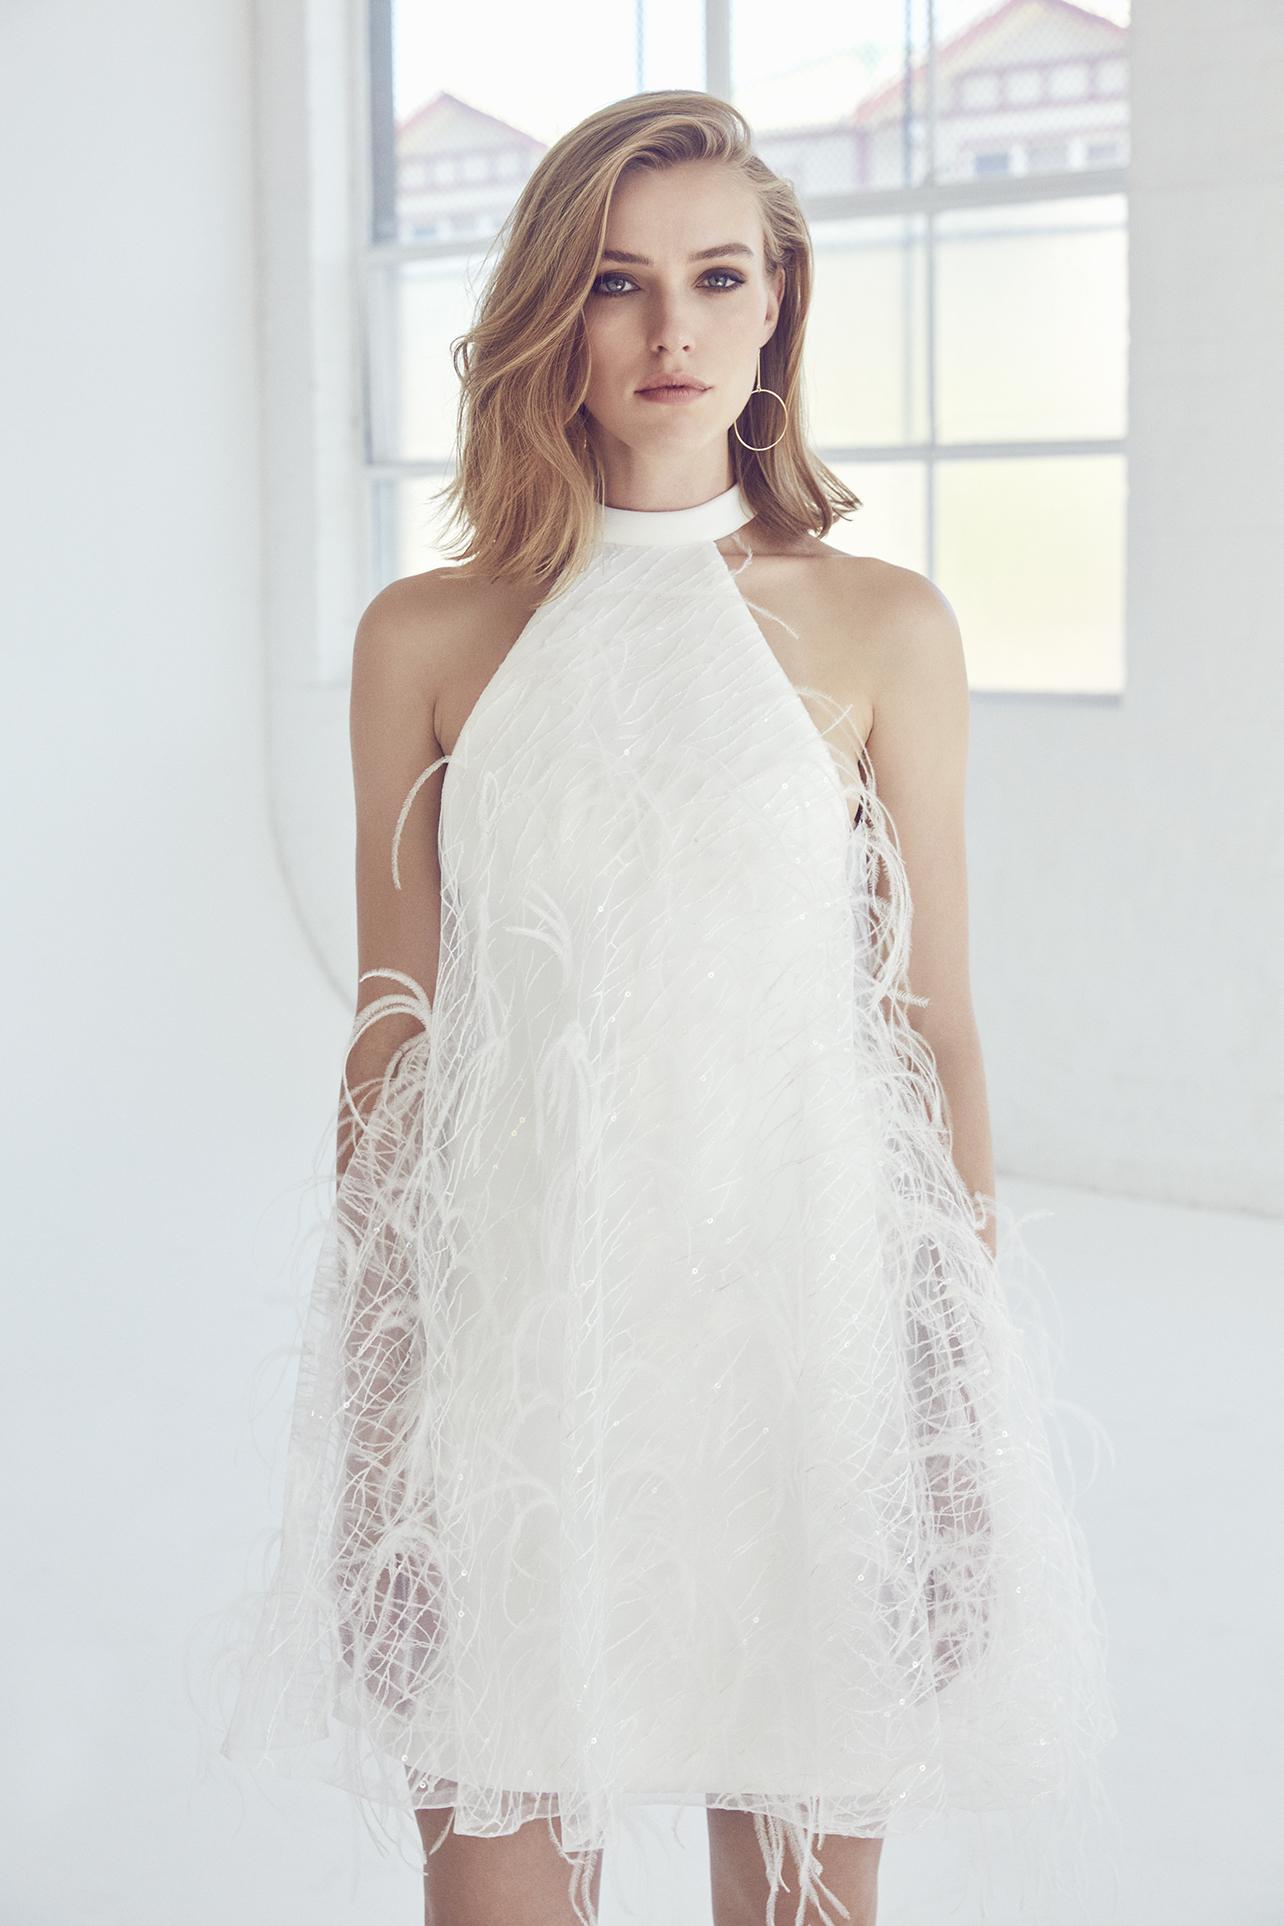 Halo Dress by Suzanne Harward   LOVE FIND CO.